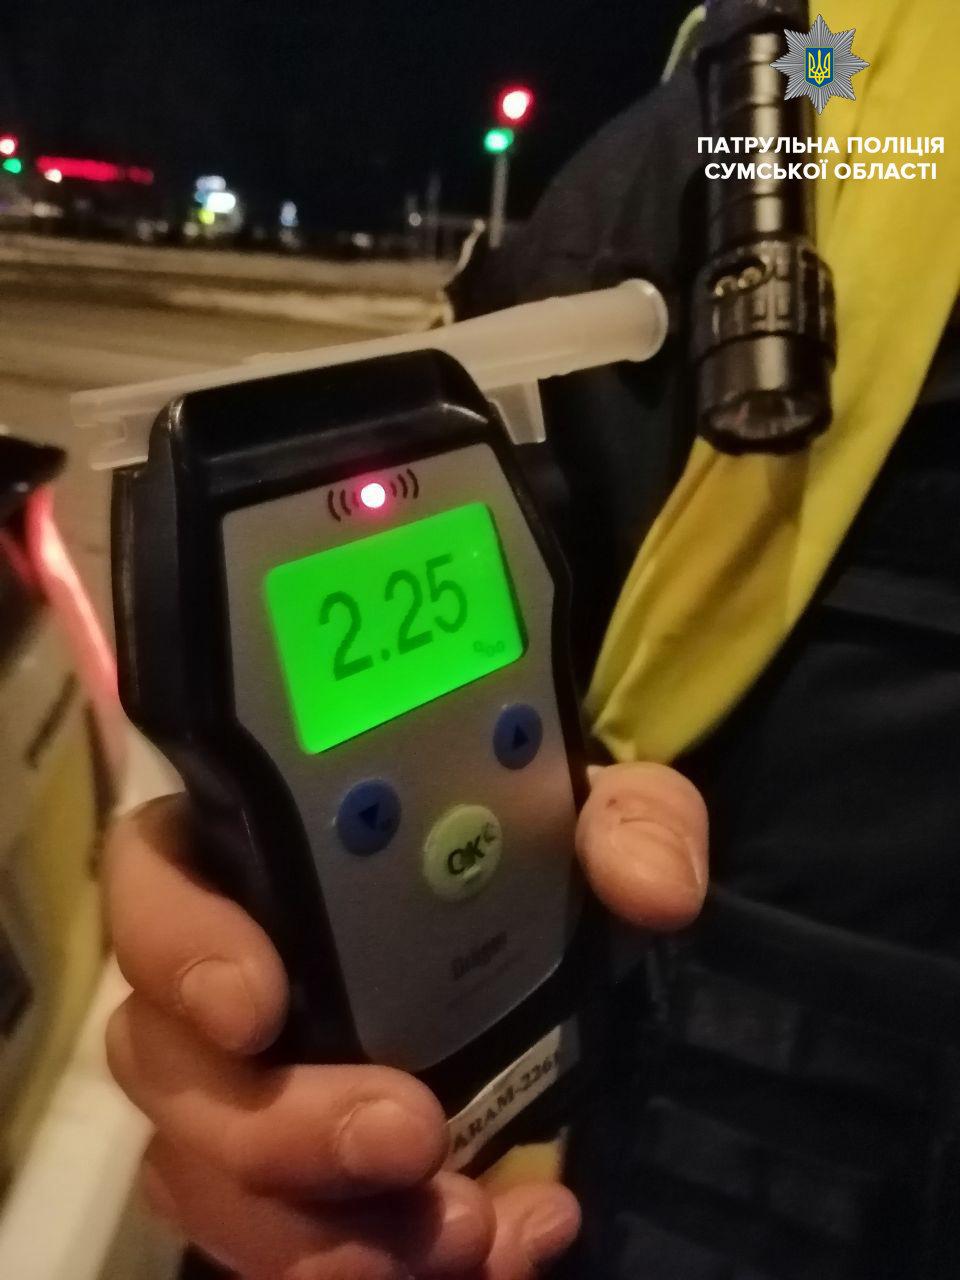 В центре Сум по вине пьяного водителя произошло ДТП, фото-4